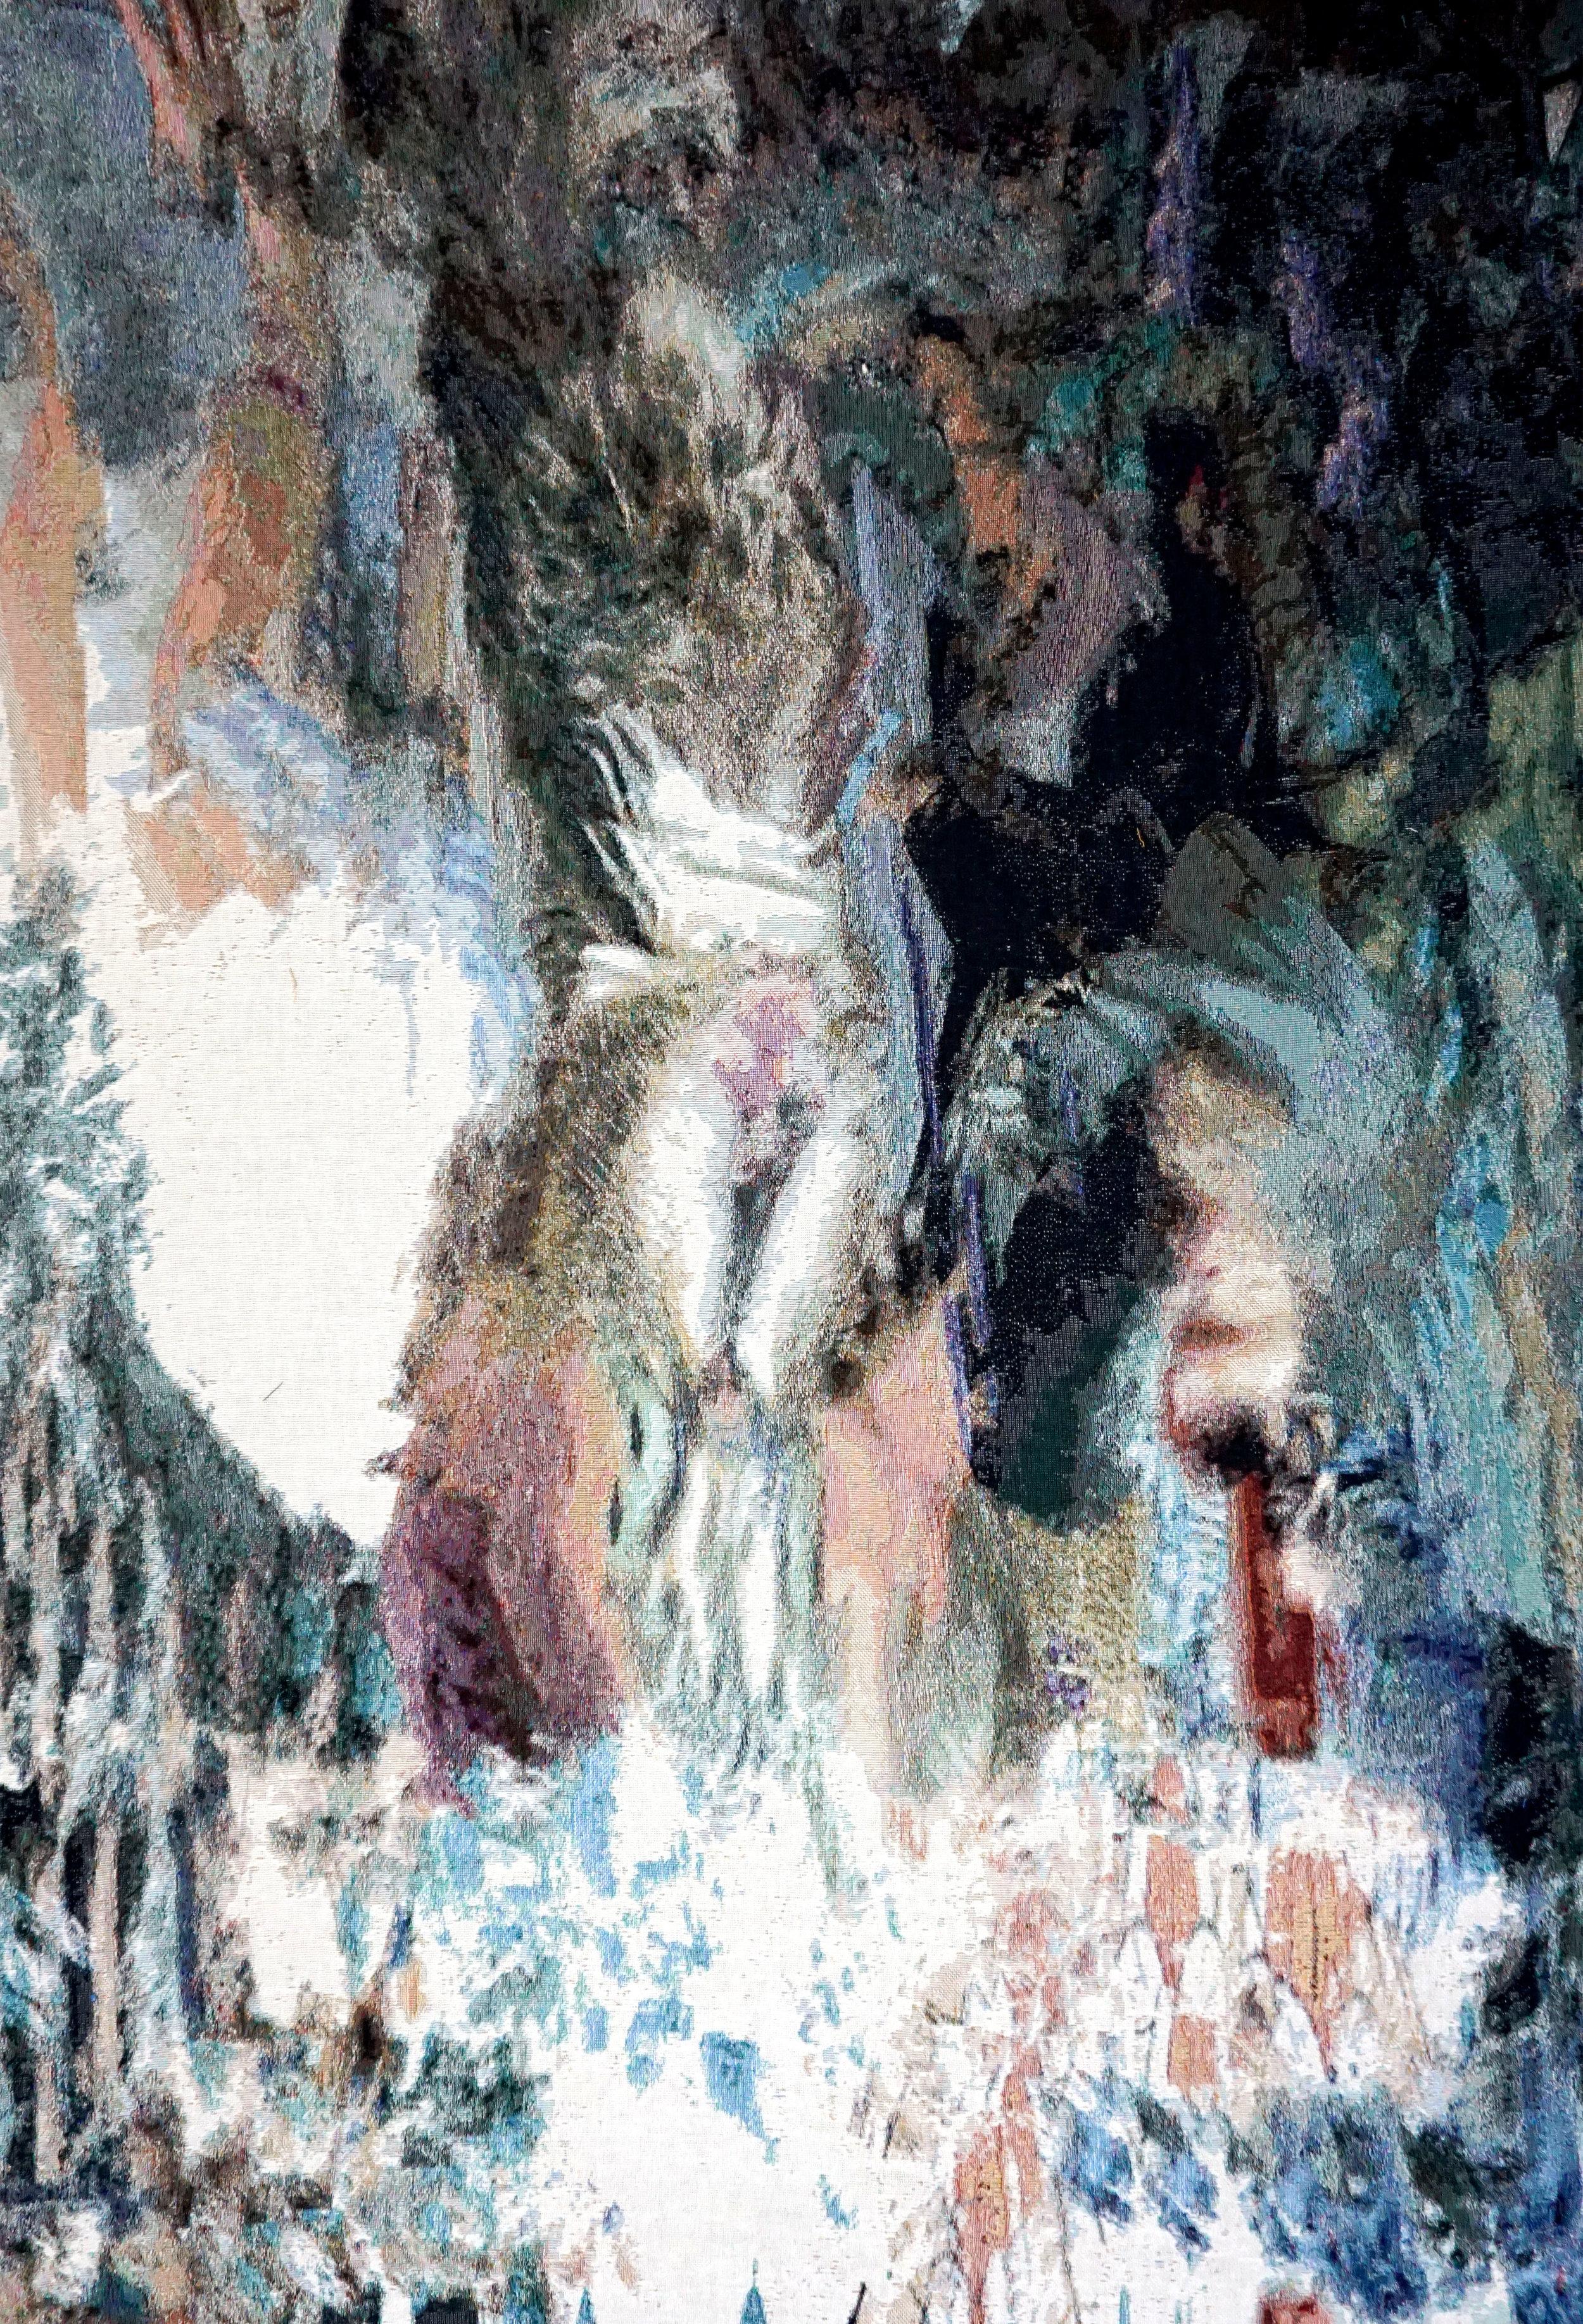 RY DAVID BRADLEY  y{]{ER3K , 2018 Dye Cotton Tapestry  190cm x 140cm